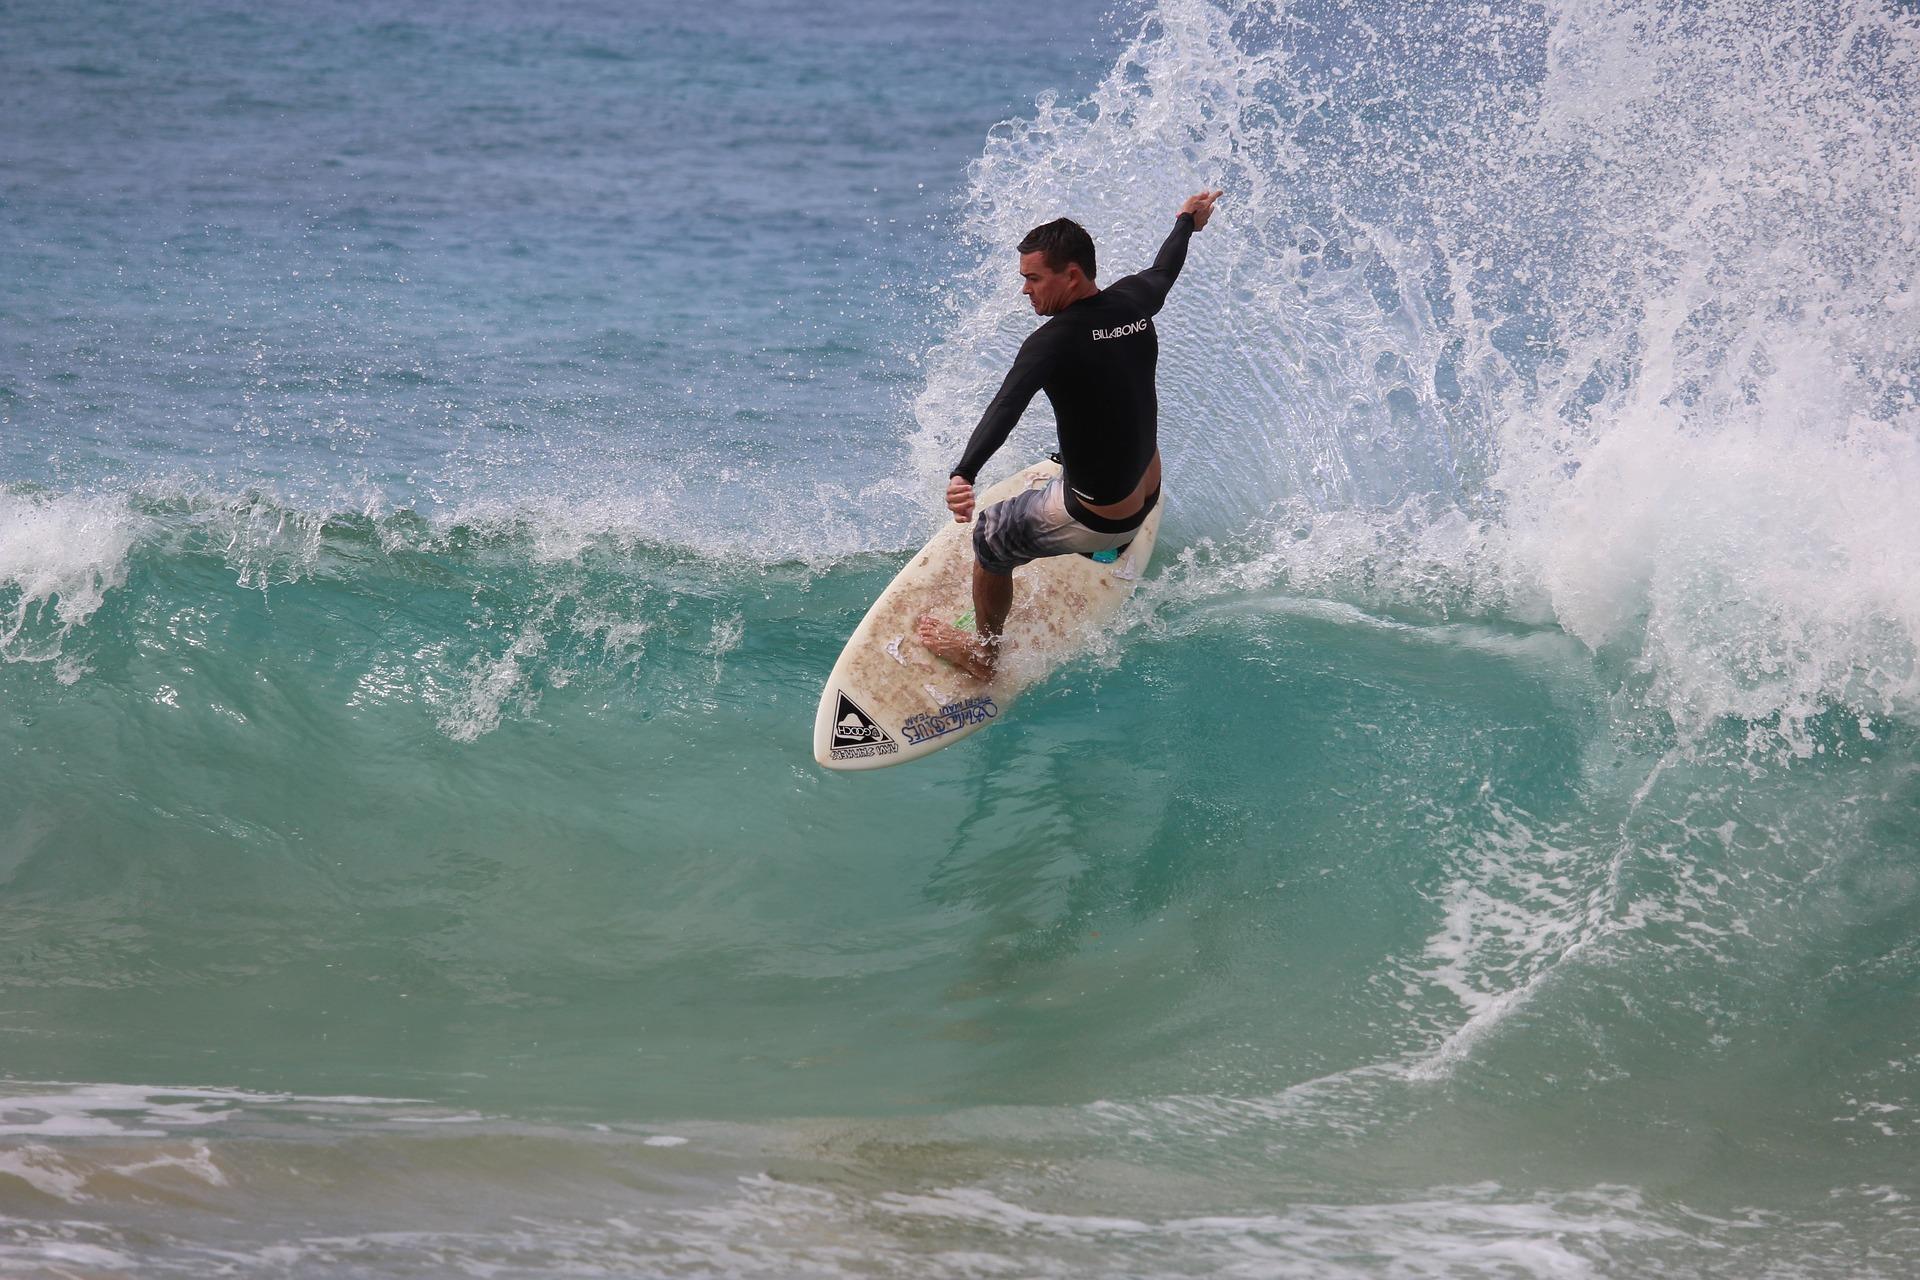 surfer-2335360_1920.jpg